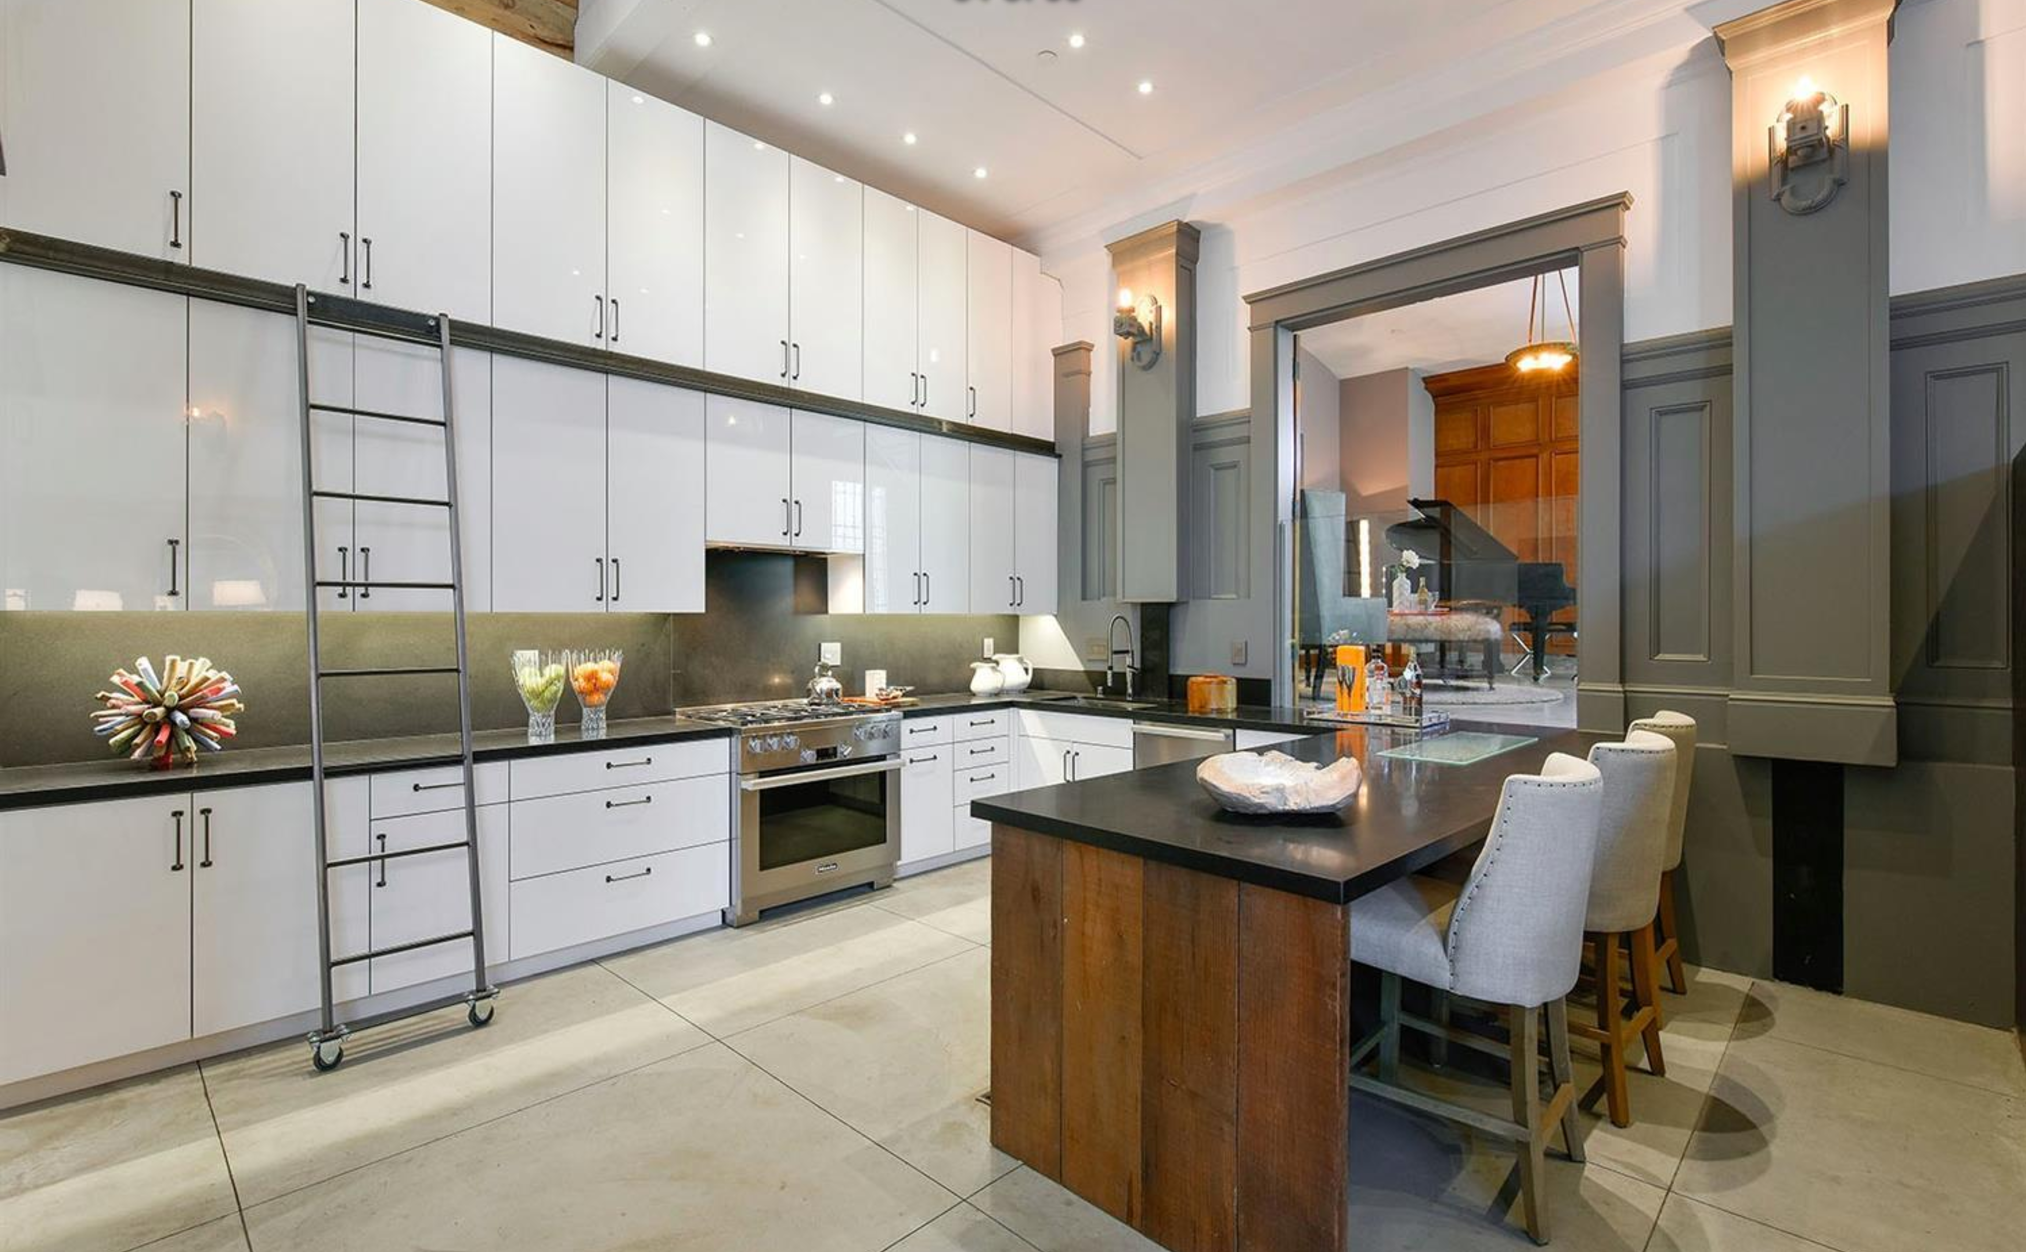 651 Dolores Street - Kitchen